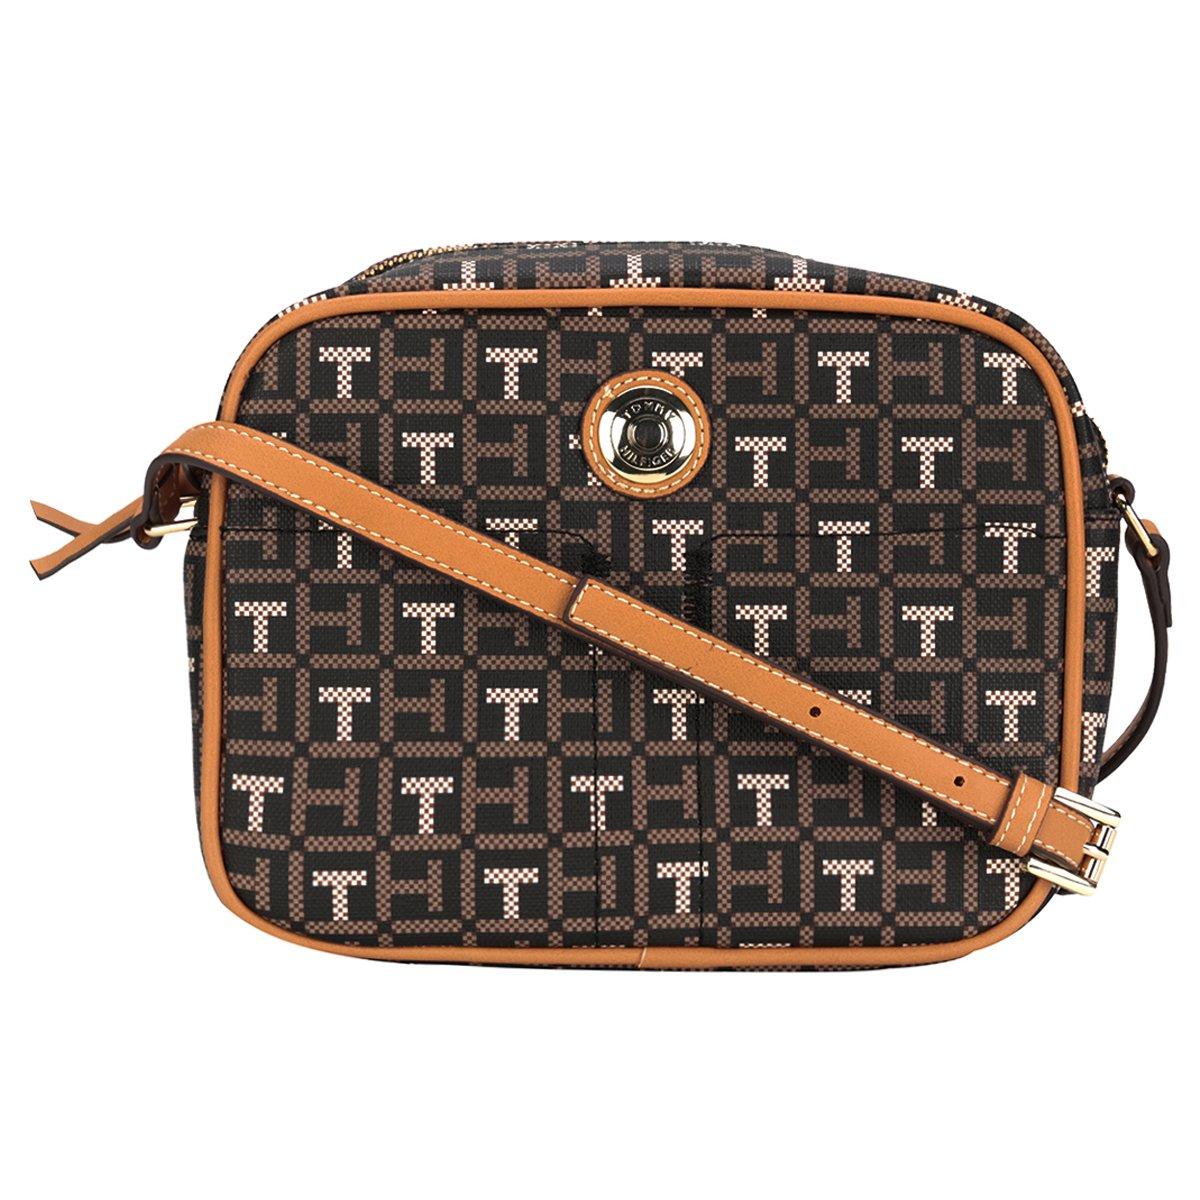 40cf437d8 Bolsa Tommy Hilfiger Club Camera Bag | Netshoes